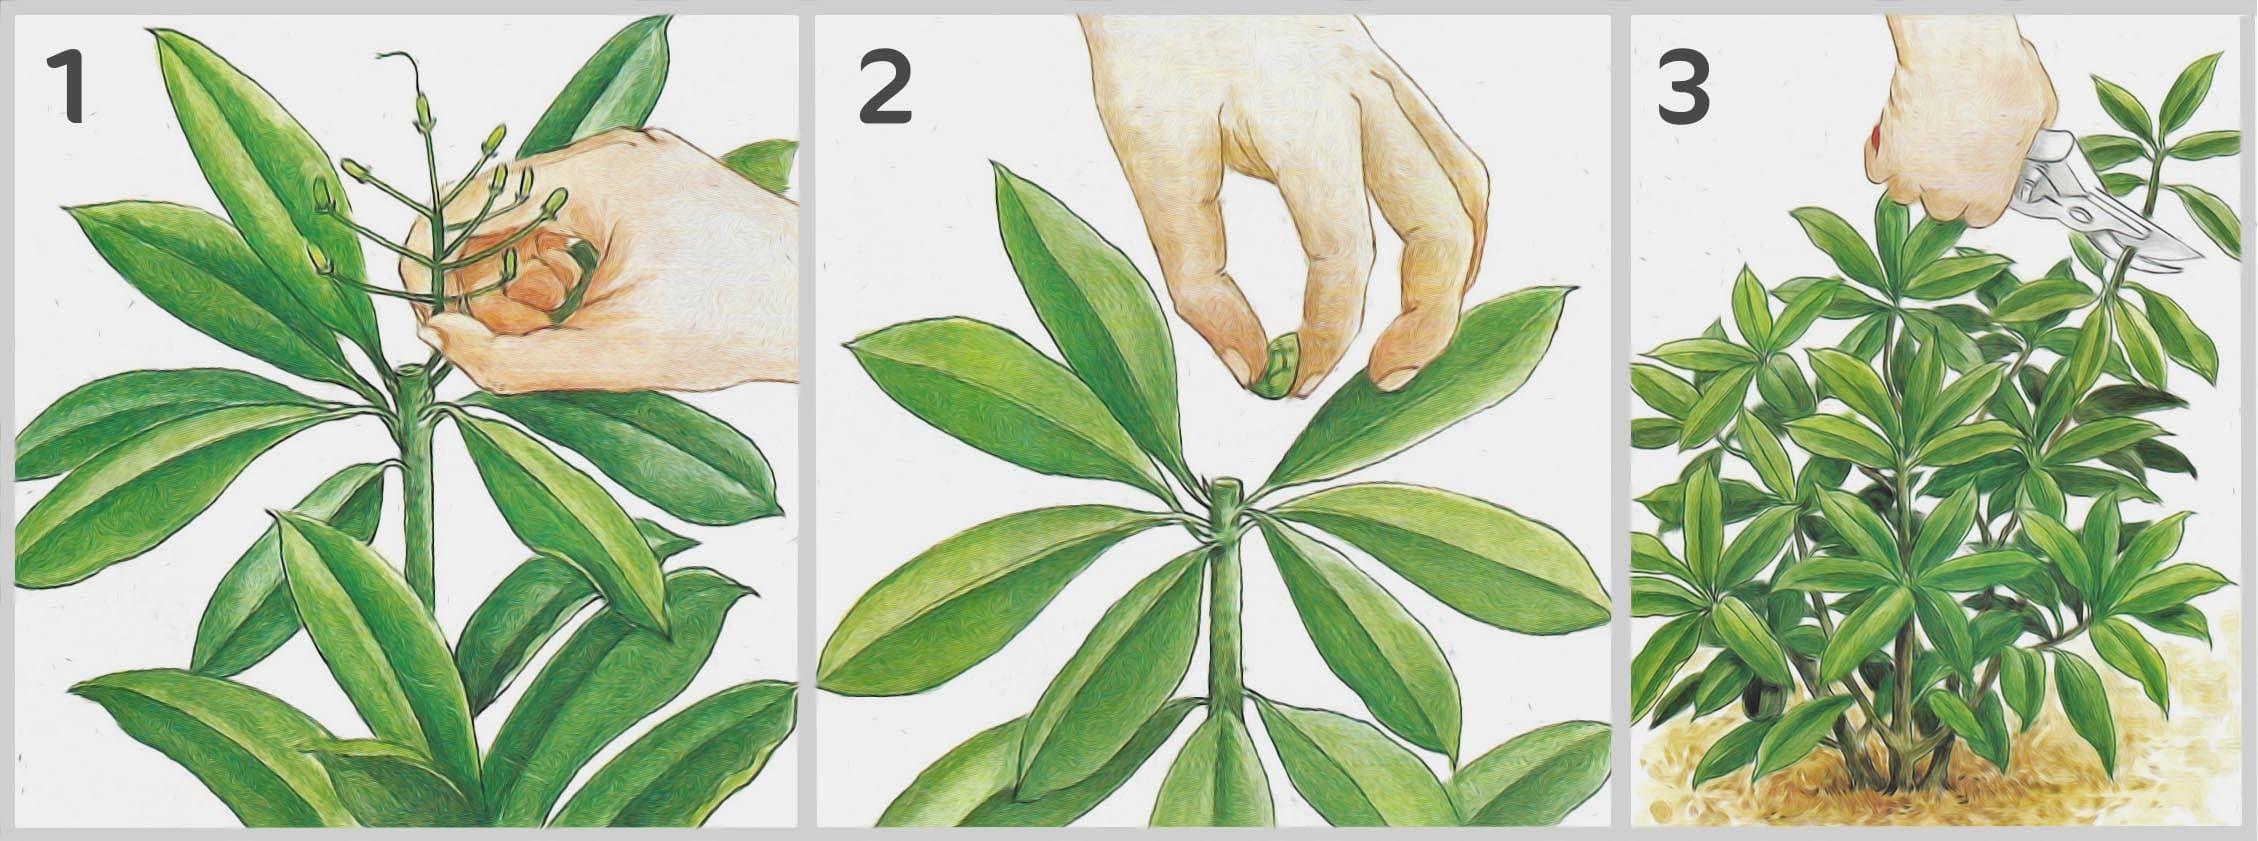 Etape Entretien Rhododendron